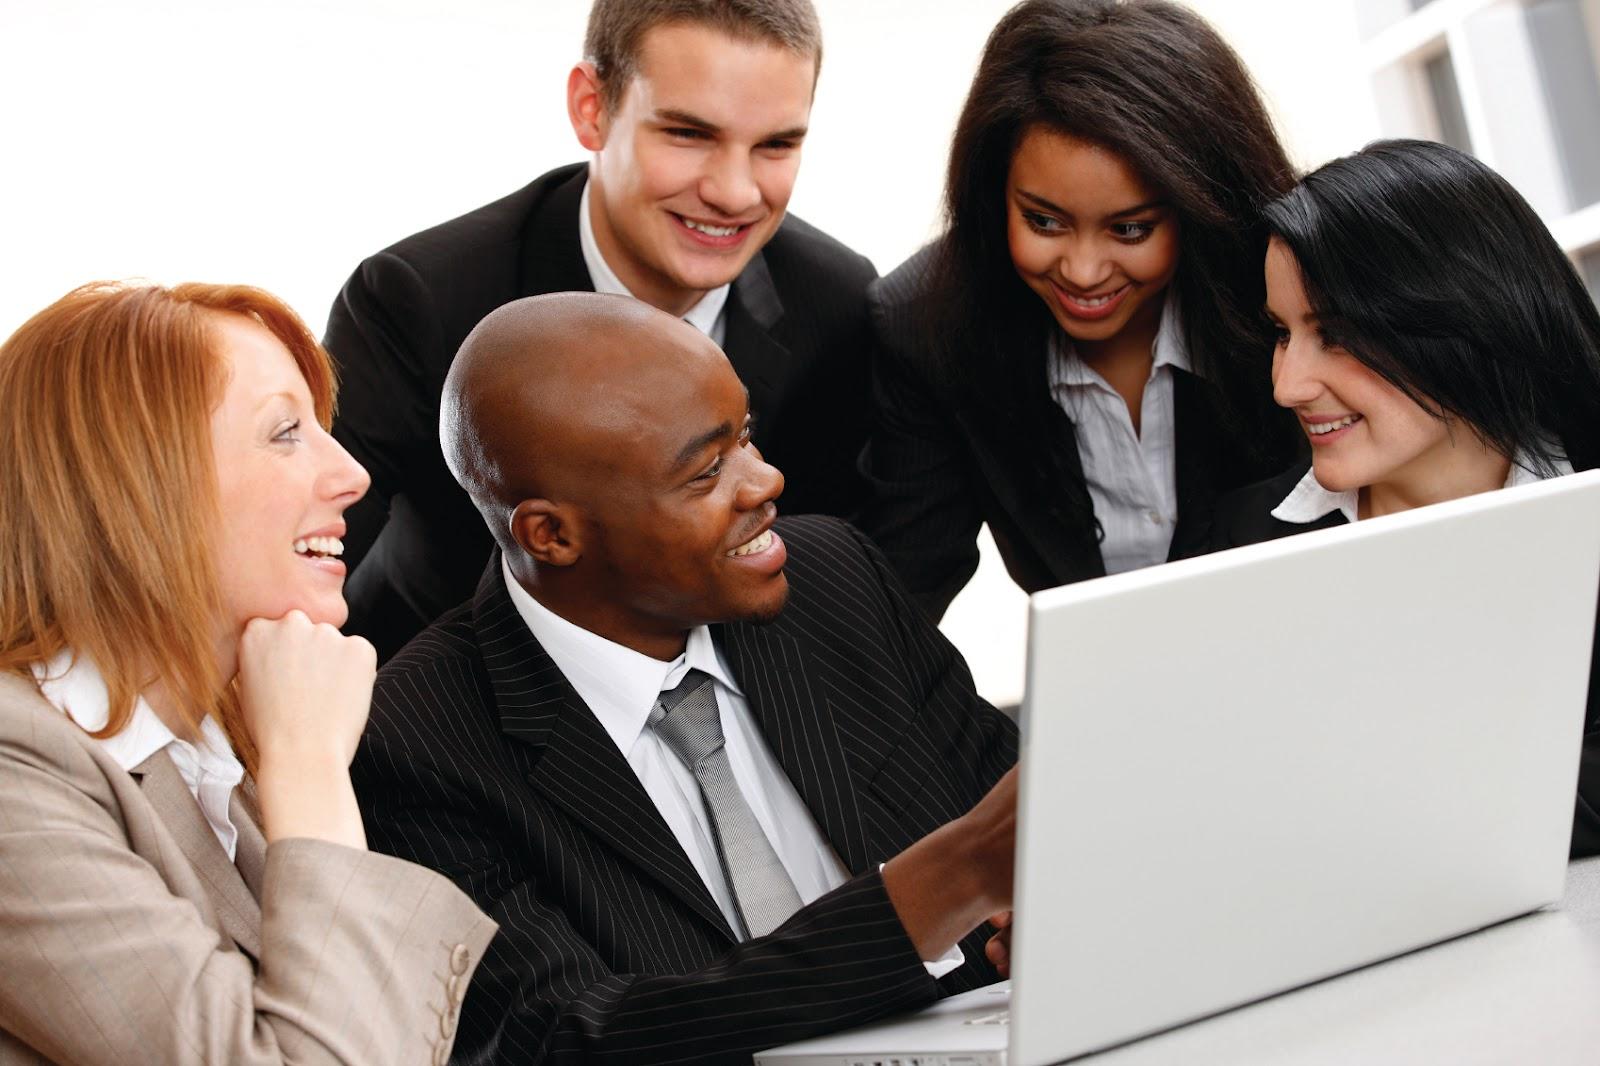 Diversity Consultants